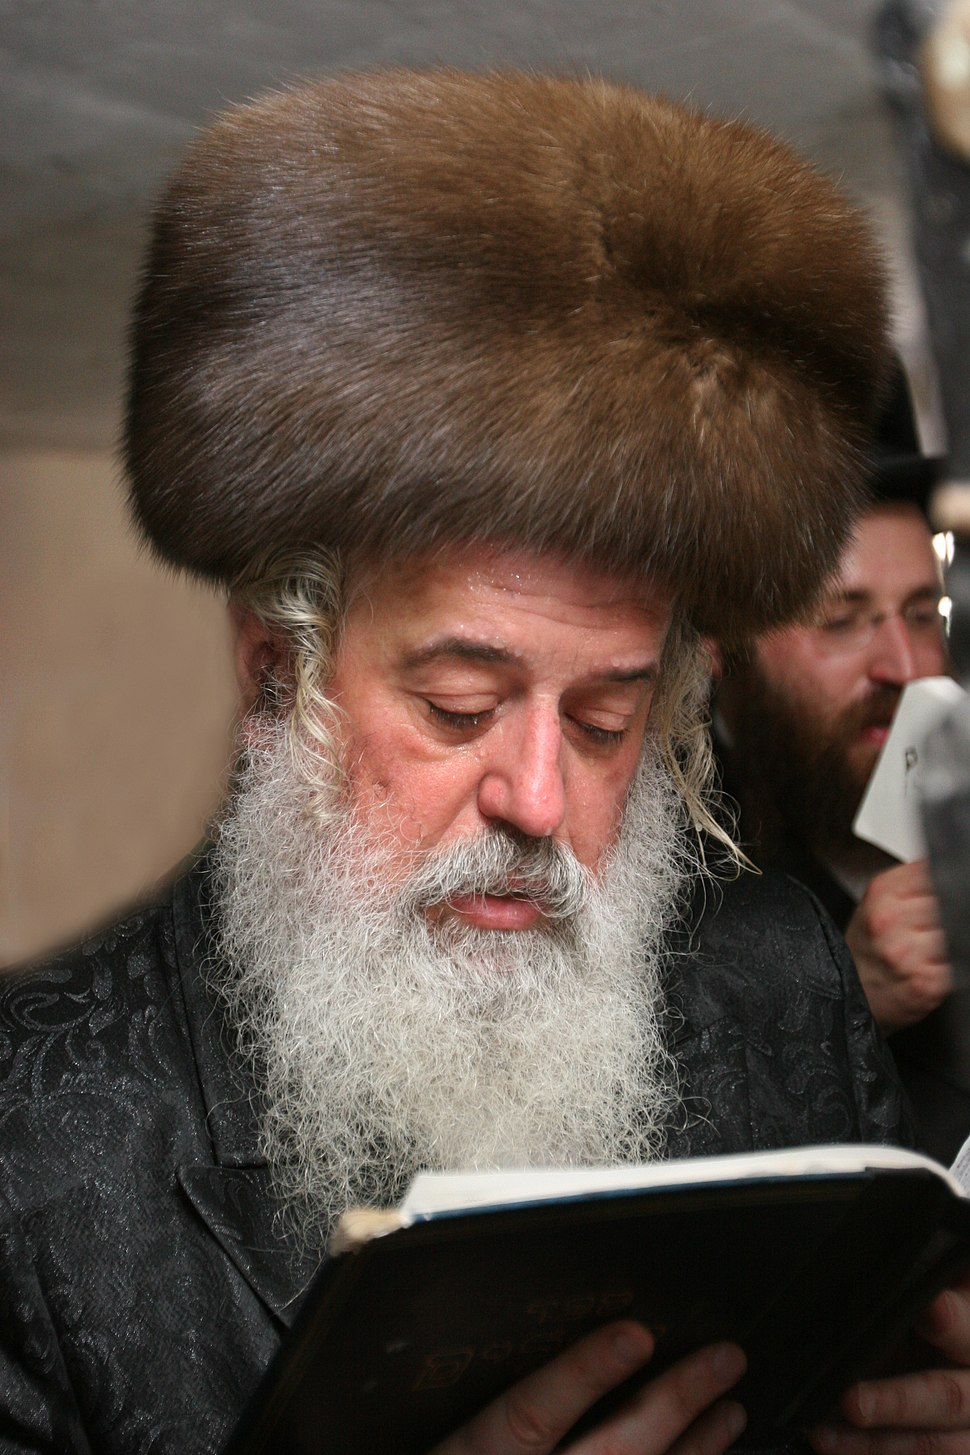 Rabbi Moshe Leib Rabinovich